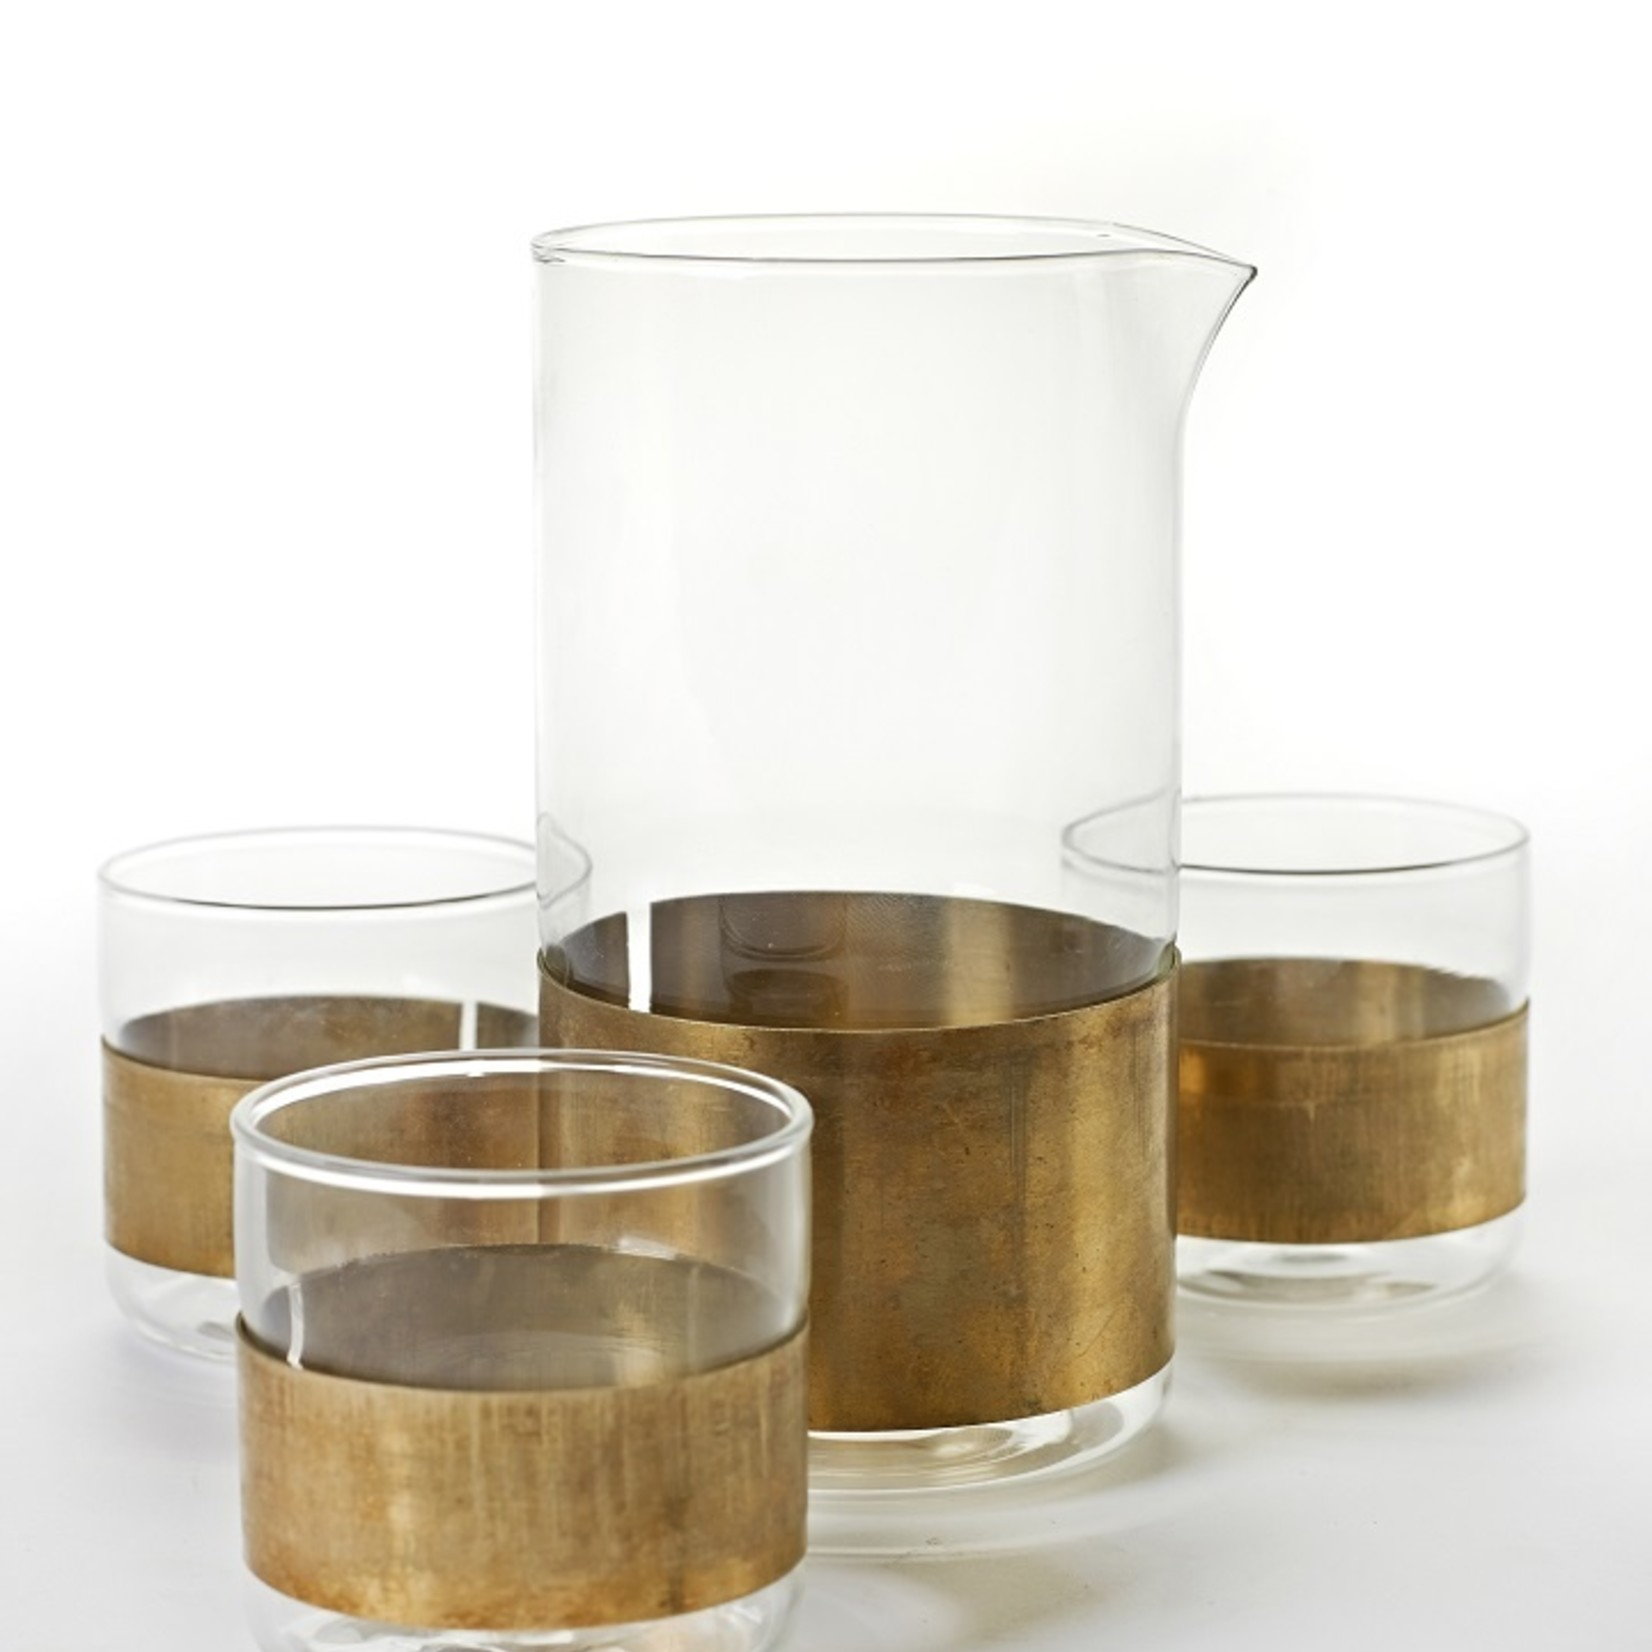 SERAX GLASS COPPER CHEMISTRY